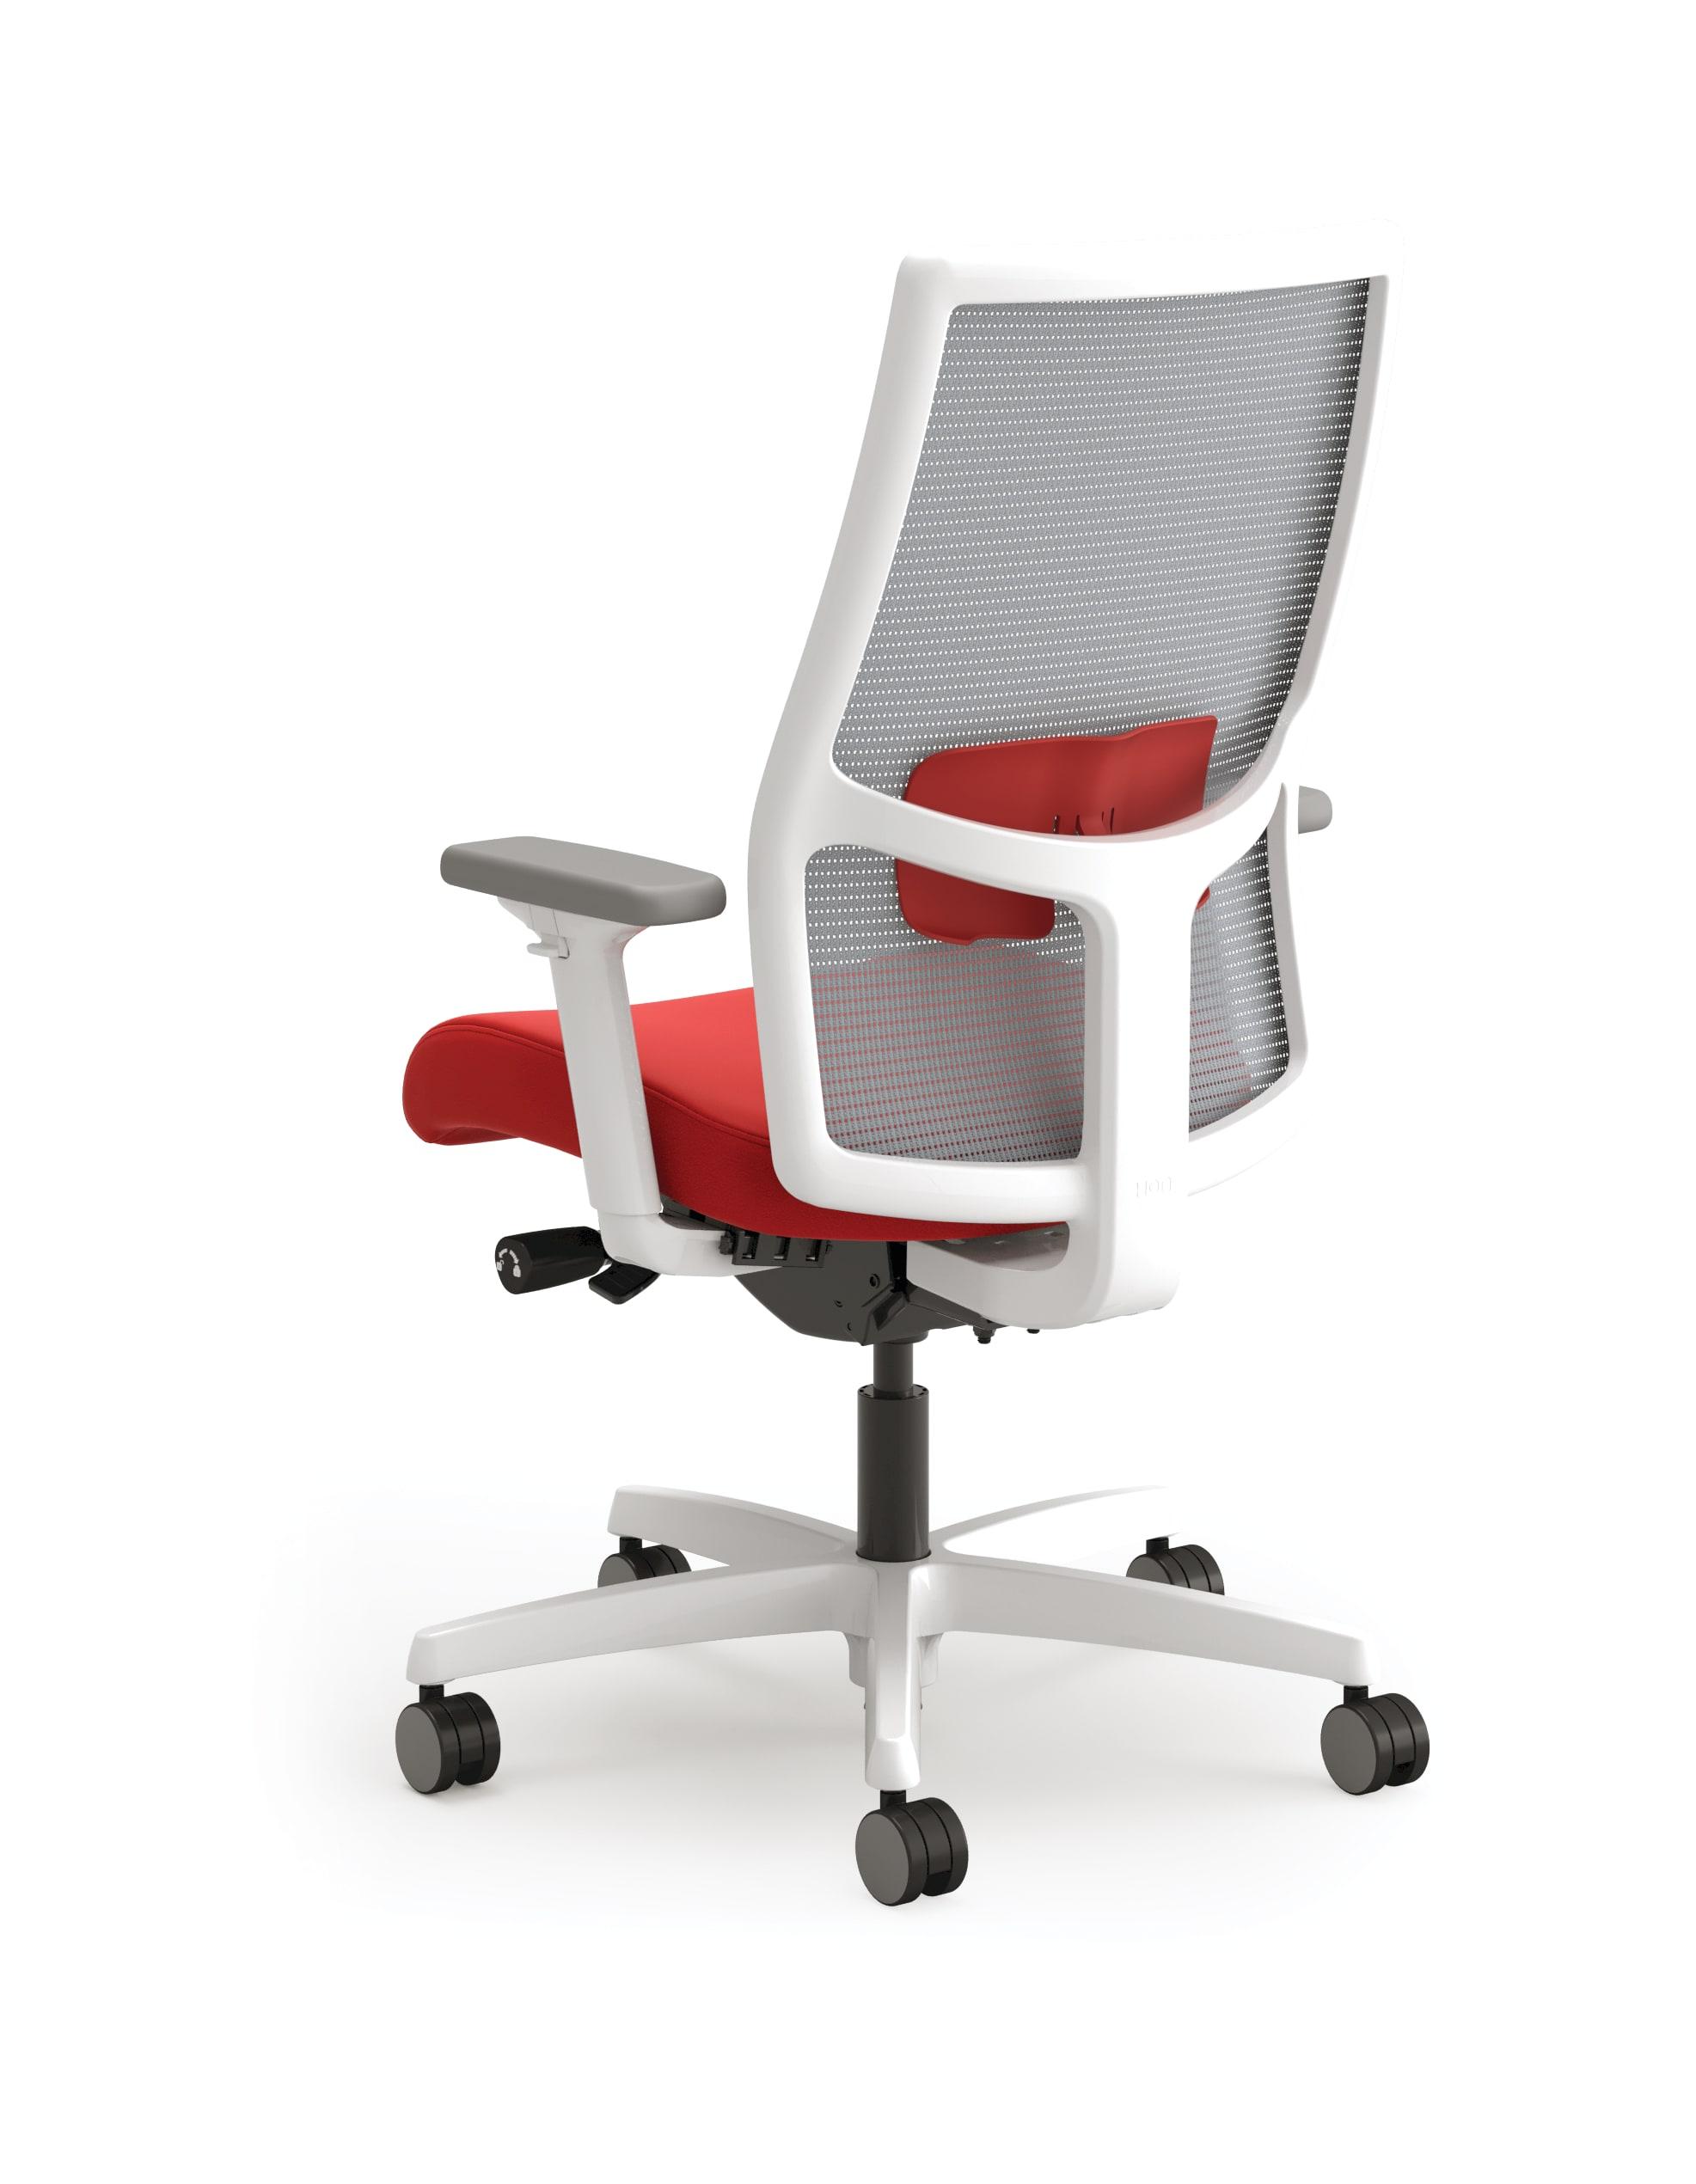 Ignition mid-back task chair with Bullseye lumbar